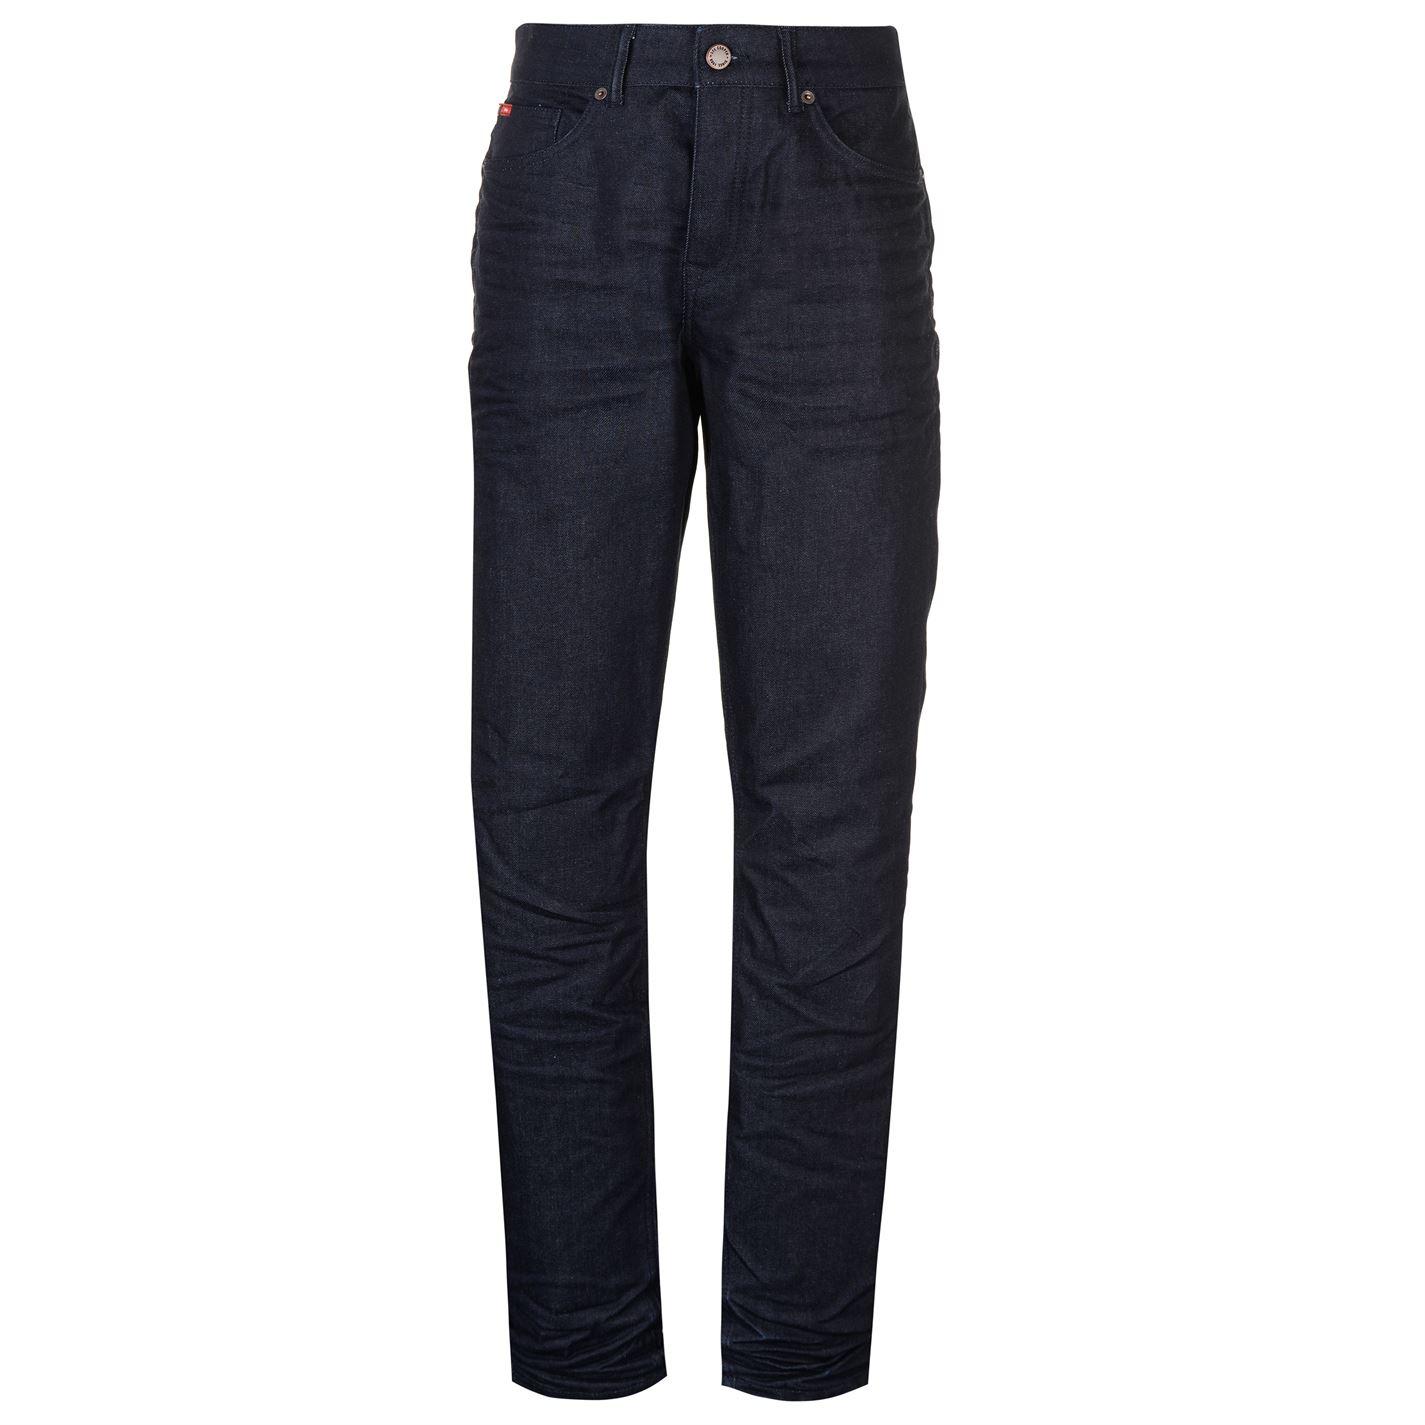 Lee Cooper Raw Harry Slim Fit Mens Jeans